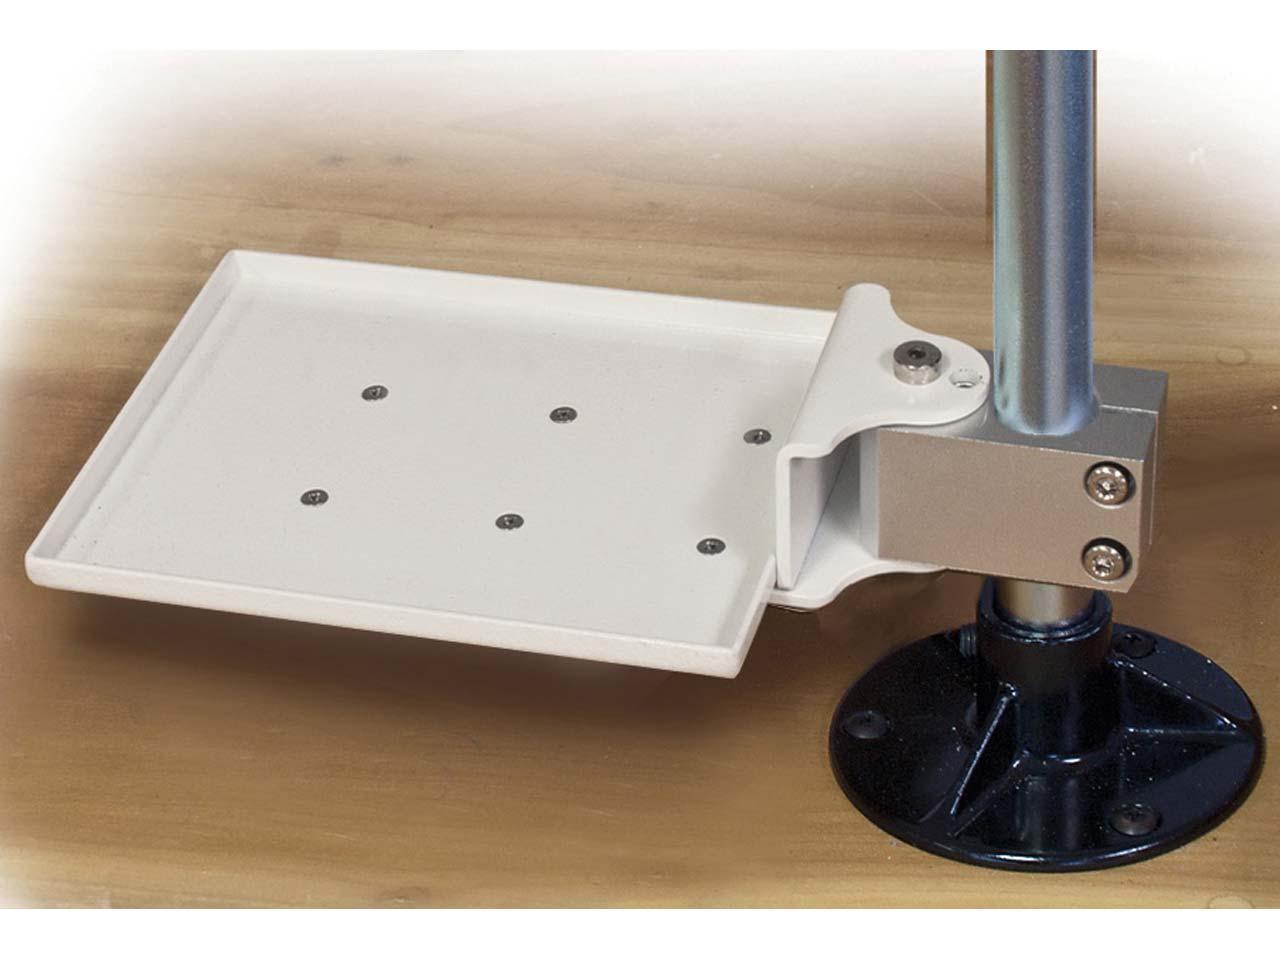 Genuine-US-Foredom-Workbench-Accessories-System miniatura 37